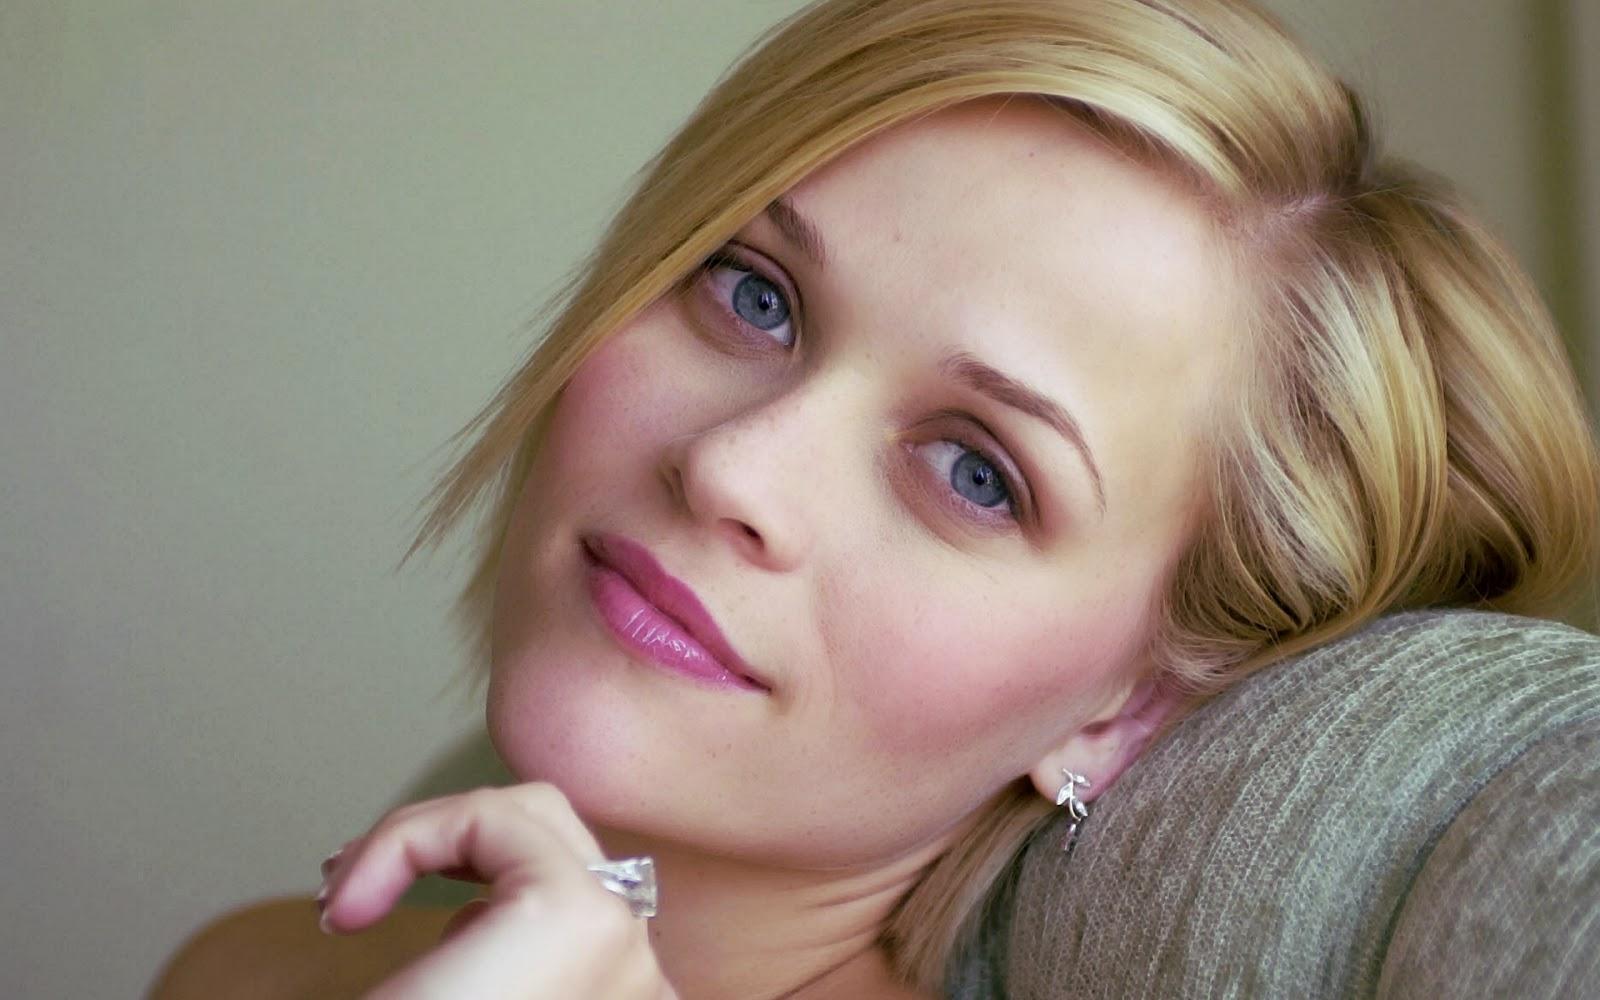 Fondos De Pantalla De Famosos: En HD Imagenes: Fondo De Pantalla Famosas Reese Witherspoon